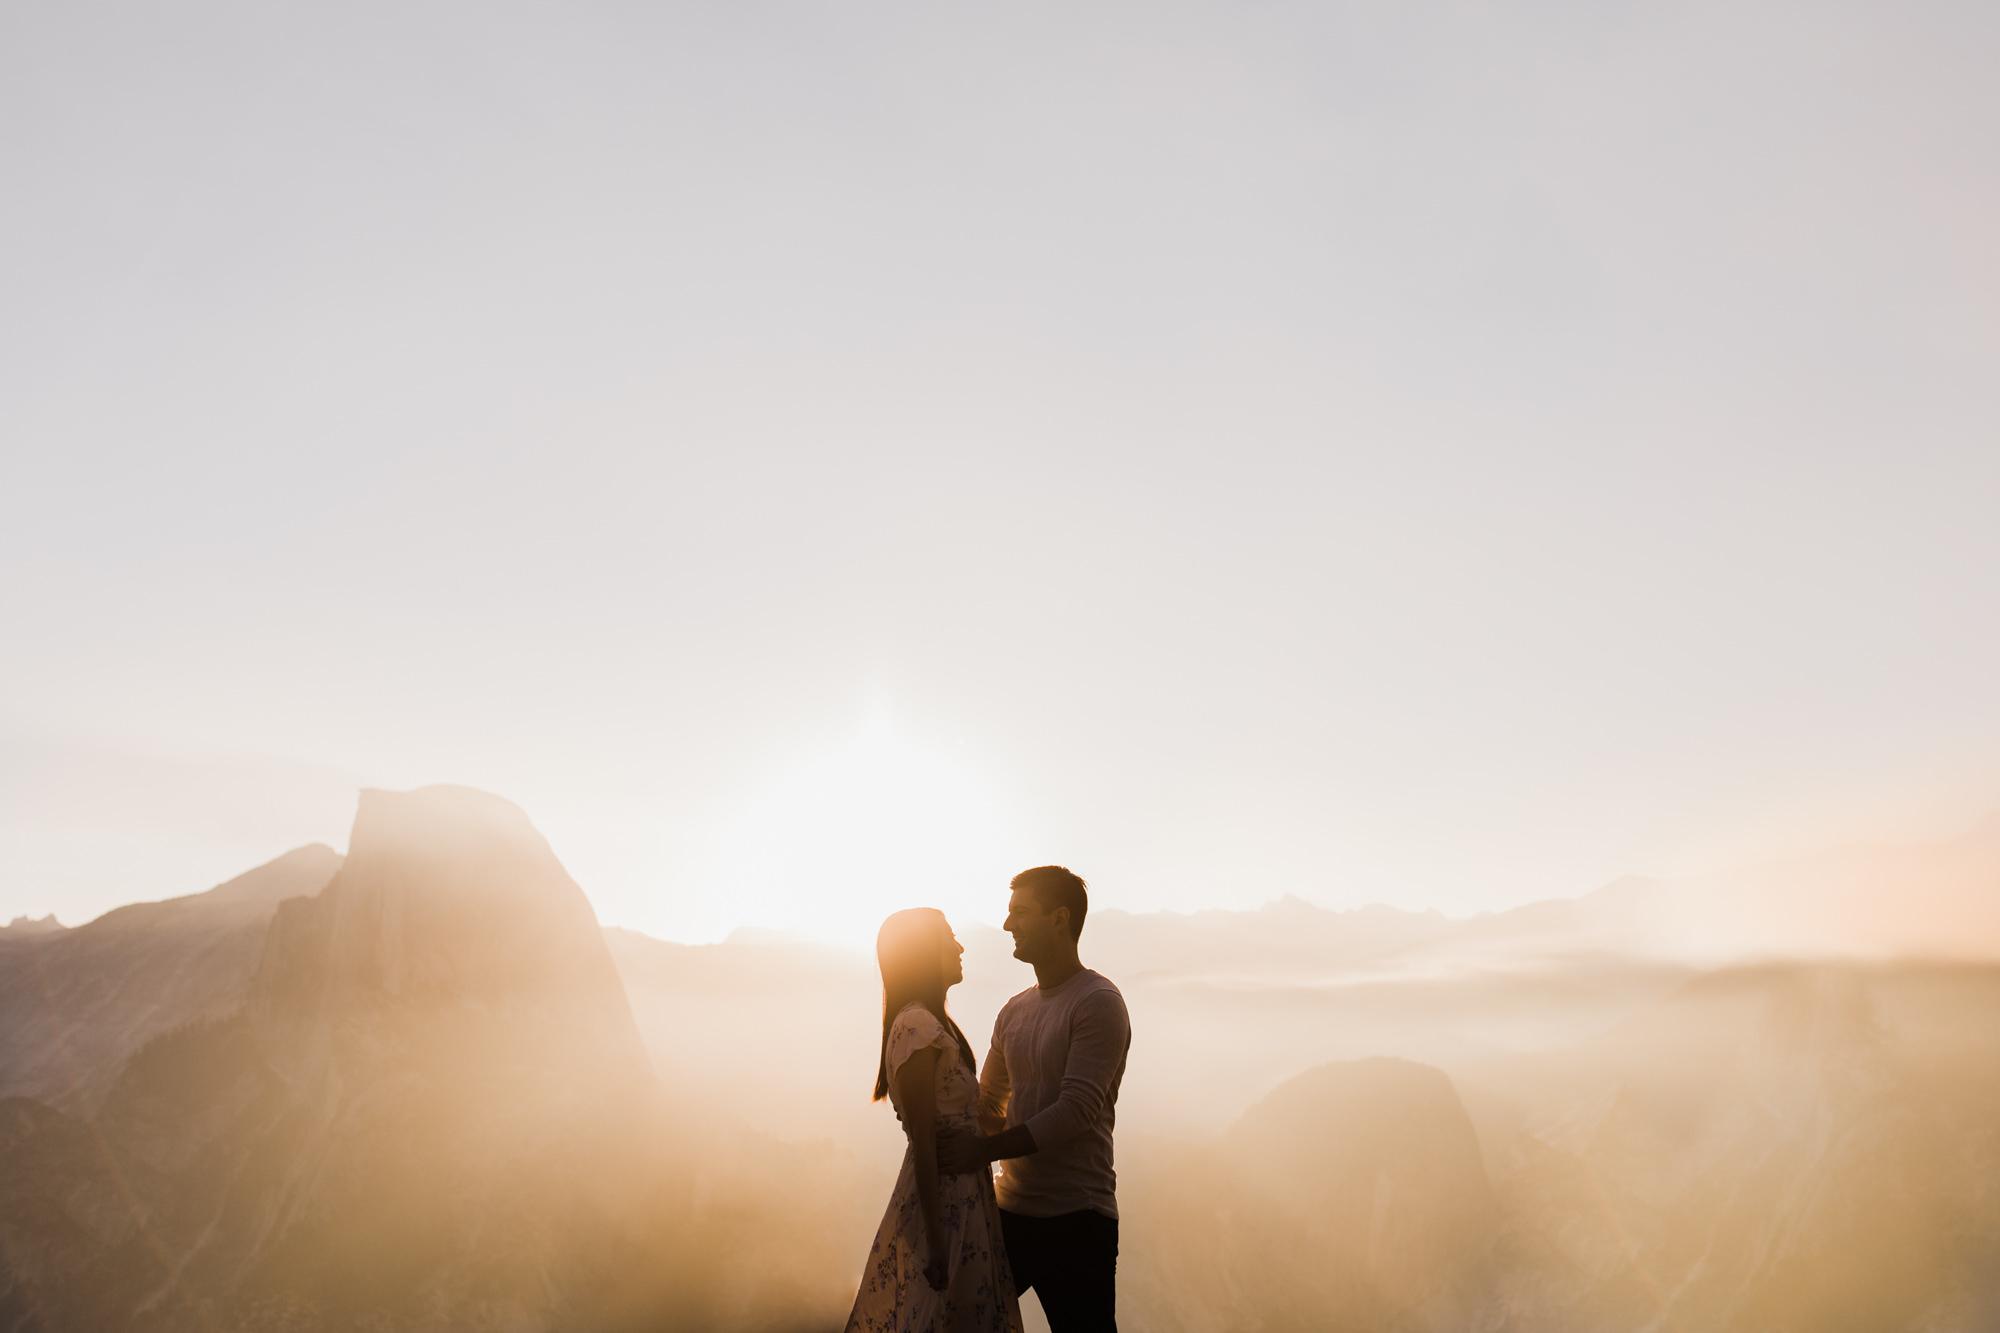 yosemite national park engagement session | destination engagement photo inspiration | utah adventure elopement photographers | the hearnes adventure photography | www.thehearnes.com